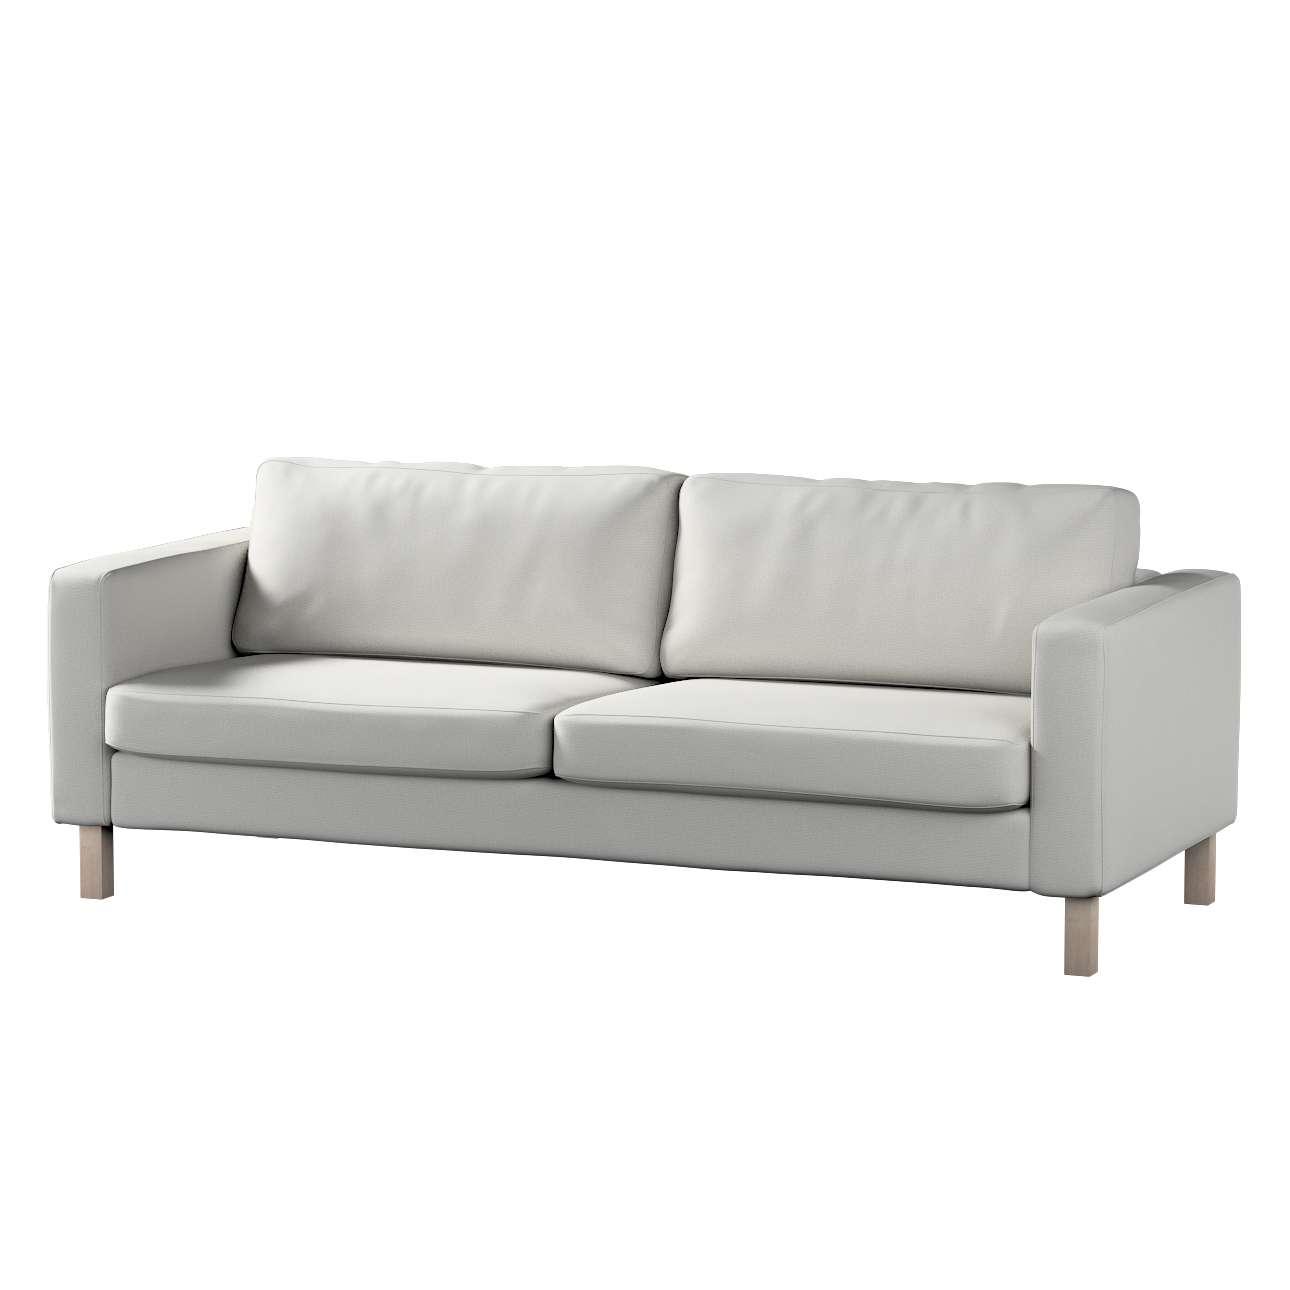 KARSLTAD trvivietės sofos užvalkalas Karlstad 3-vietės sofos užvalkalas (neišlankstomai sofai) kolekcijoje Etna , audinys: 705-90